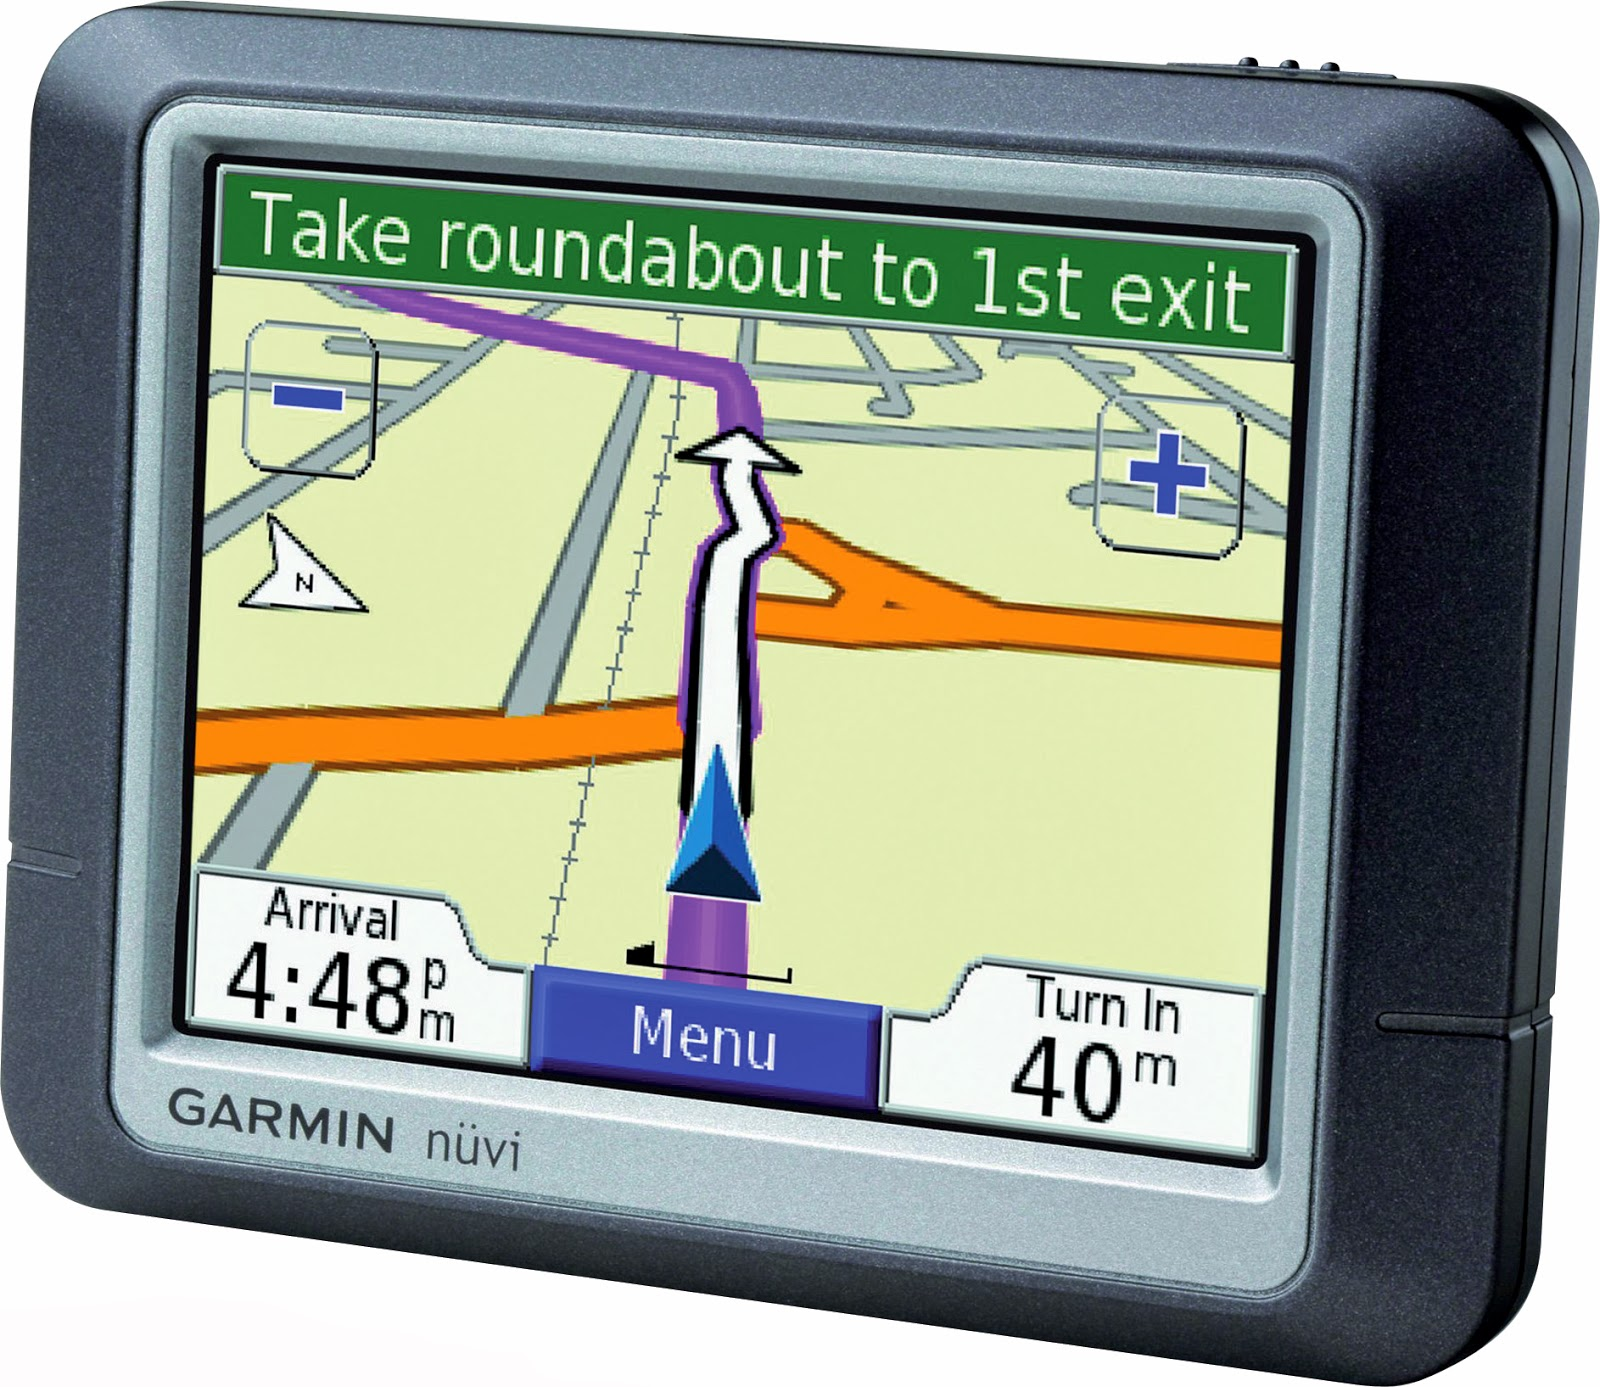 How To Update Garmin Nuvi >> Sustainable Adventure Updating Garmin Nuvi 250 Maps